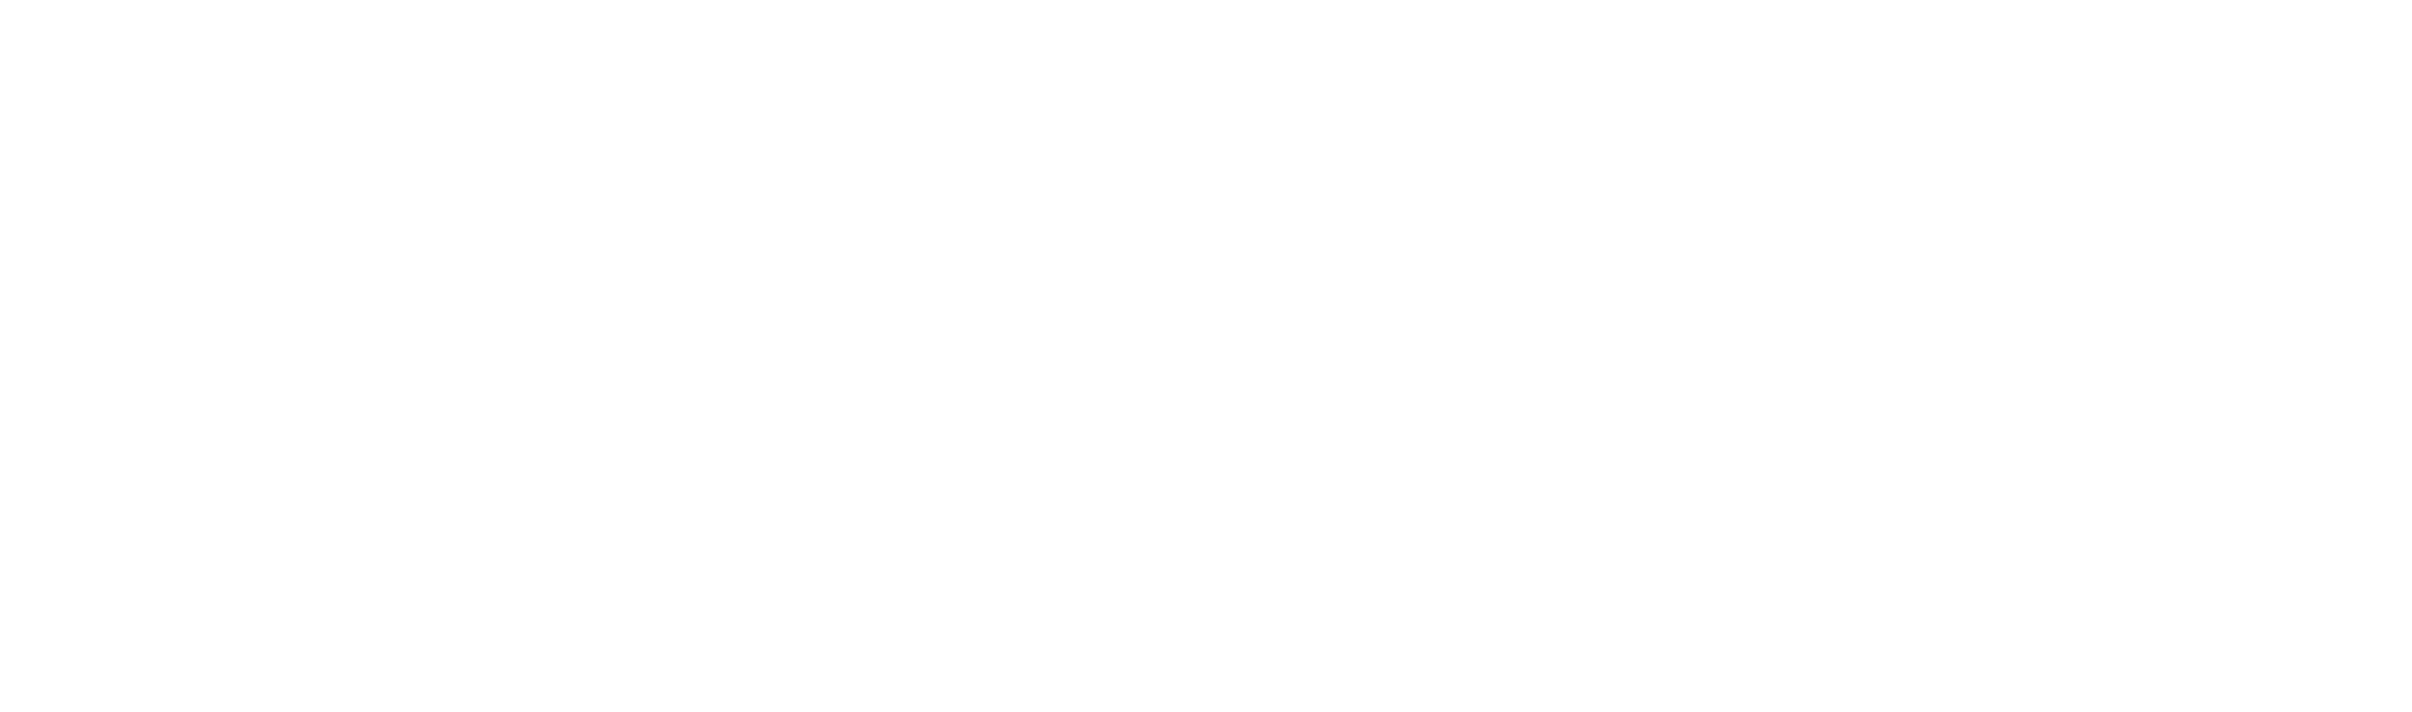 Oscar Correa | COMPASS